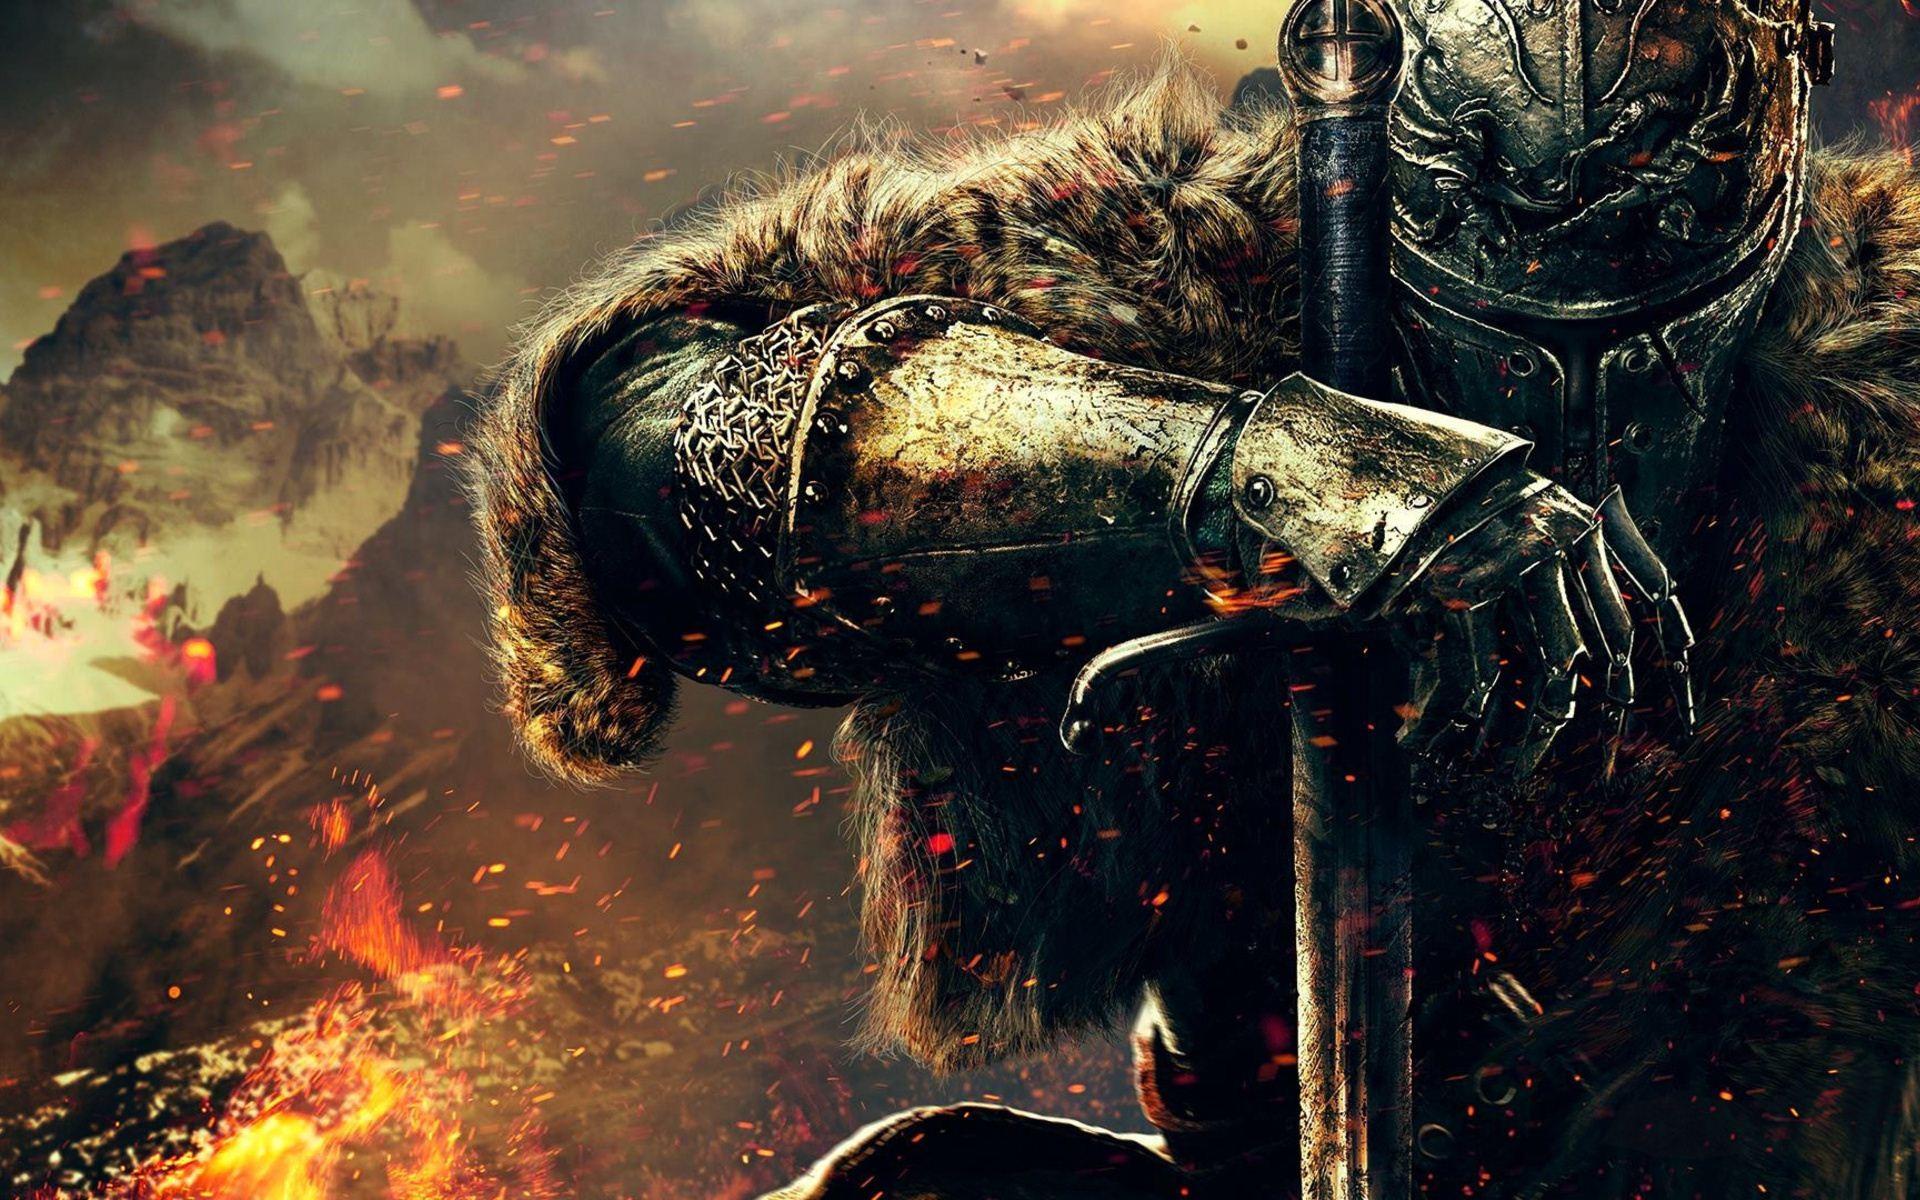 3d Sword Games Hd Wallpaper For Mobile: Fondos De Pantalla : Videojuegos, Caballero, Dark Souls II